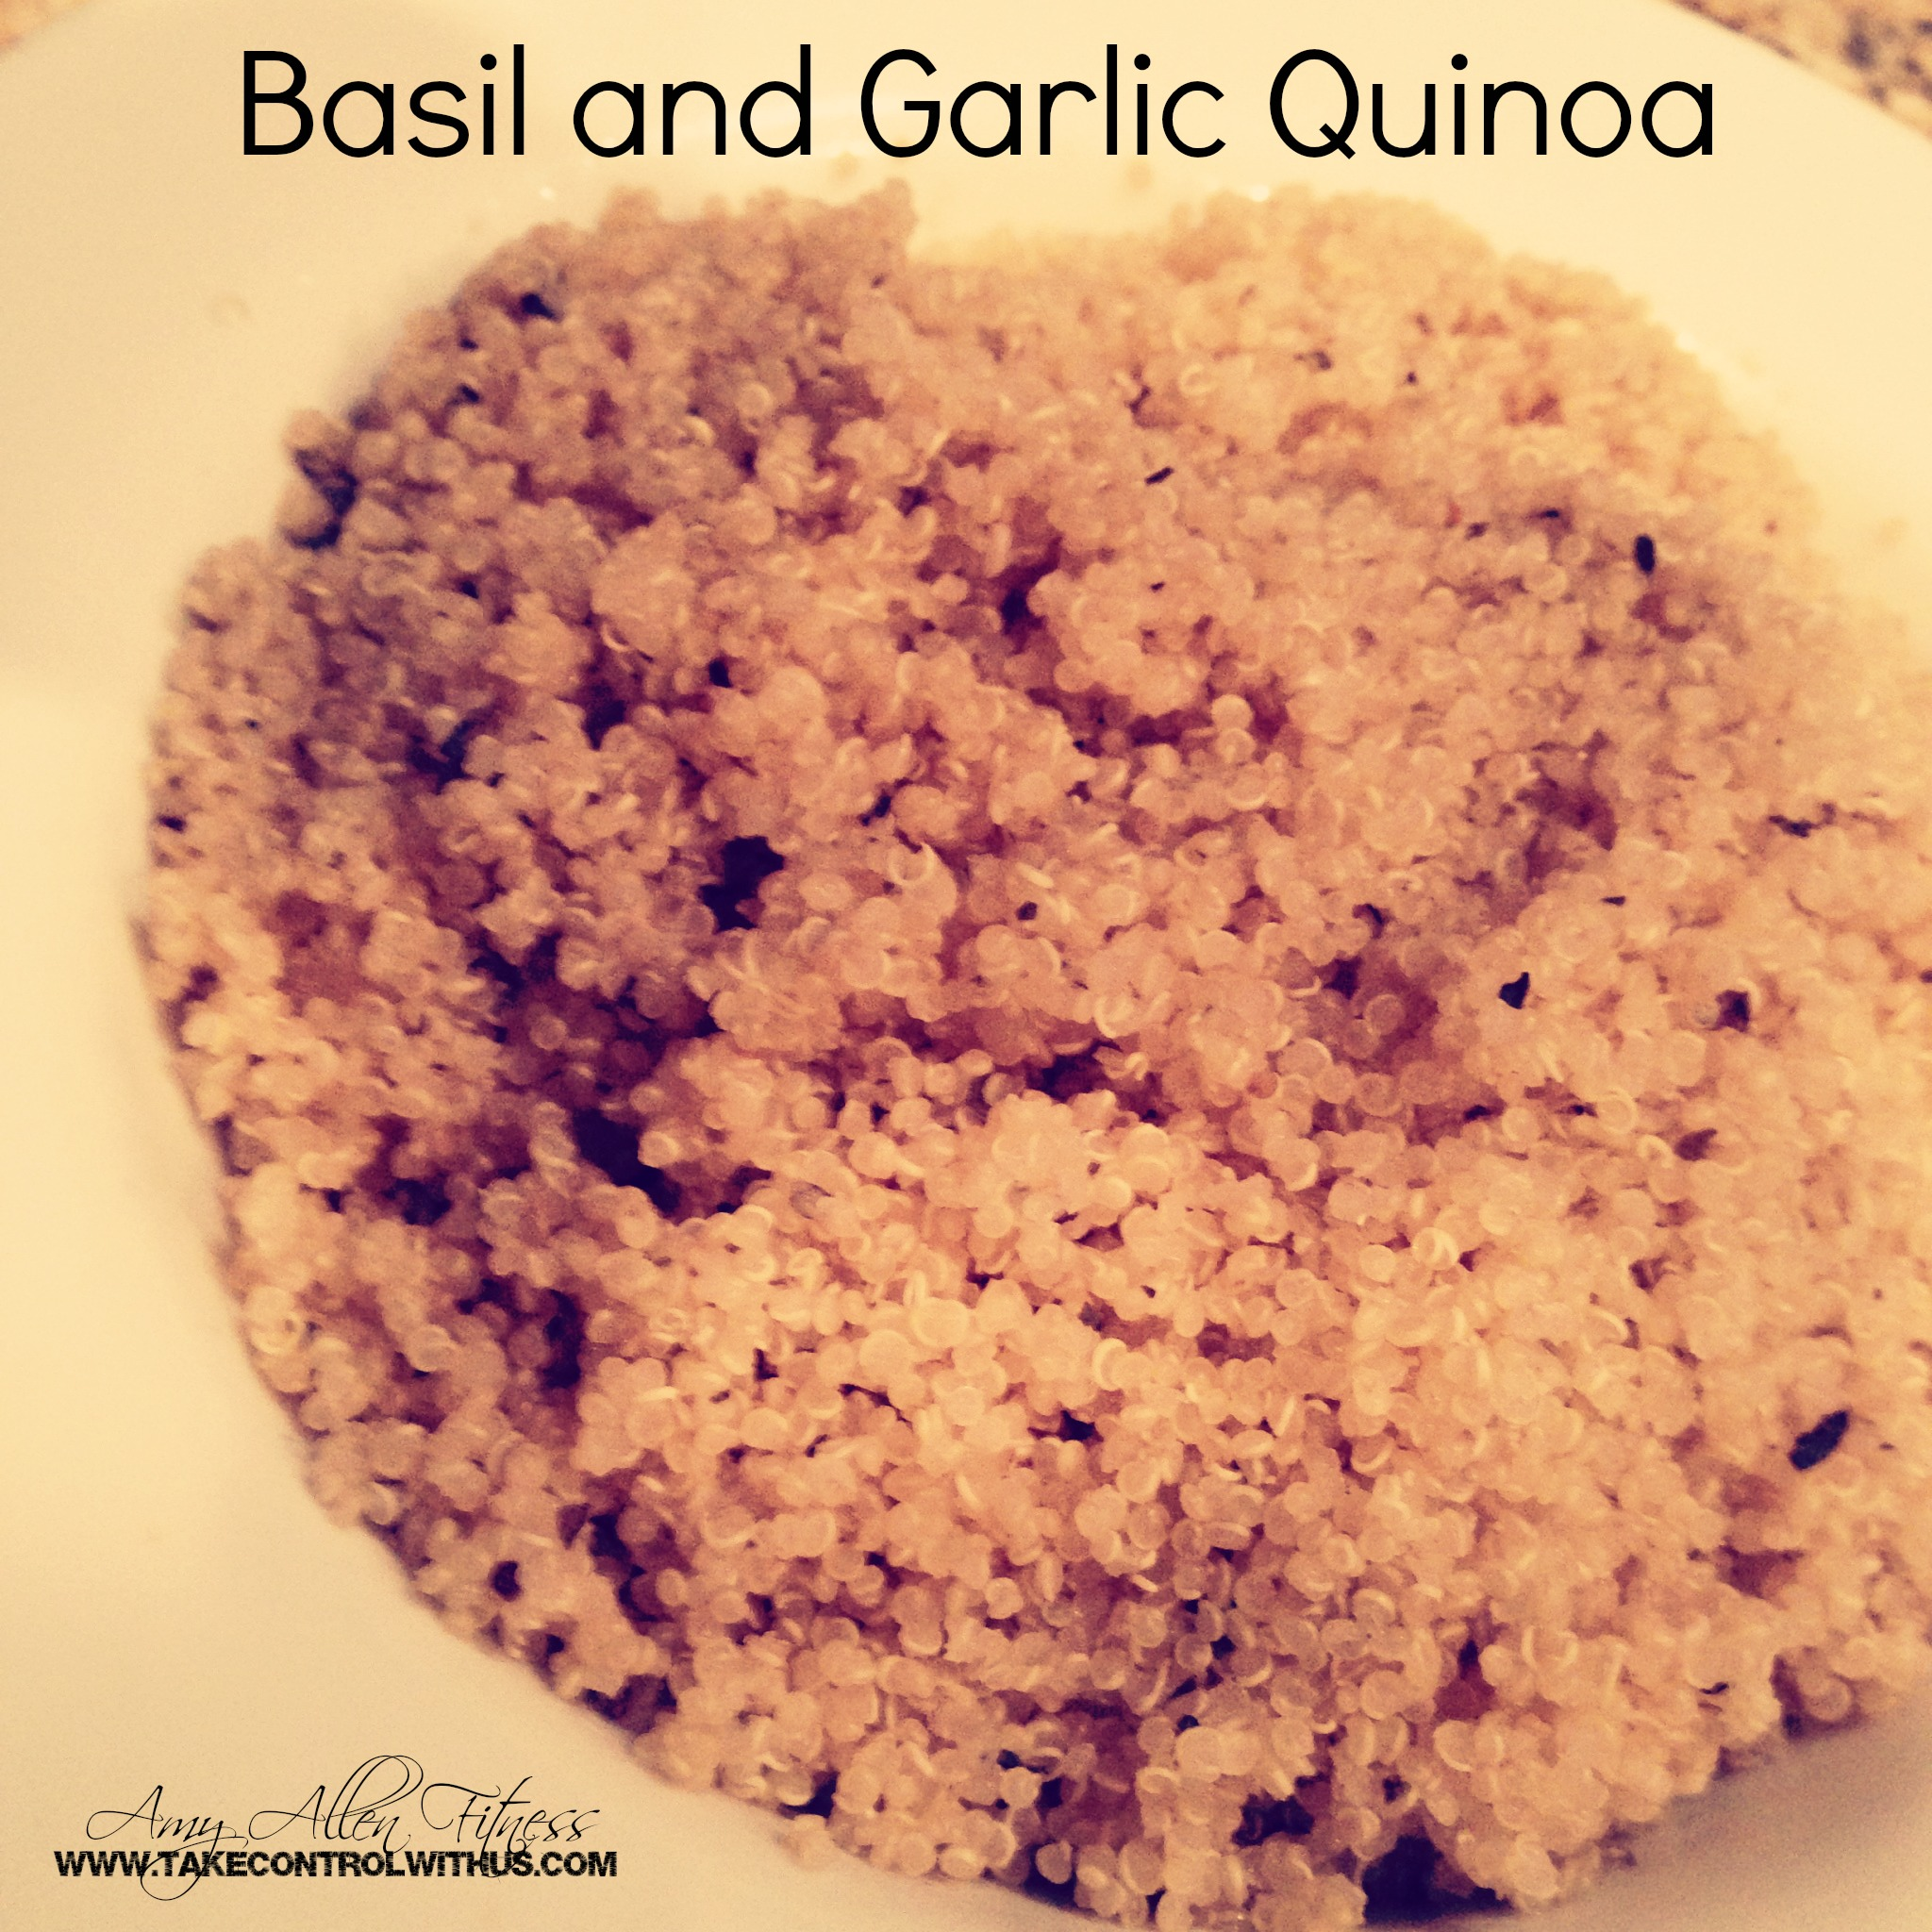 Garlic and Basil Quinoa (makes 8 1/2 cup servings)